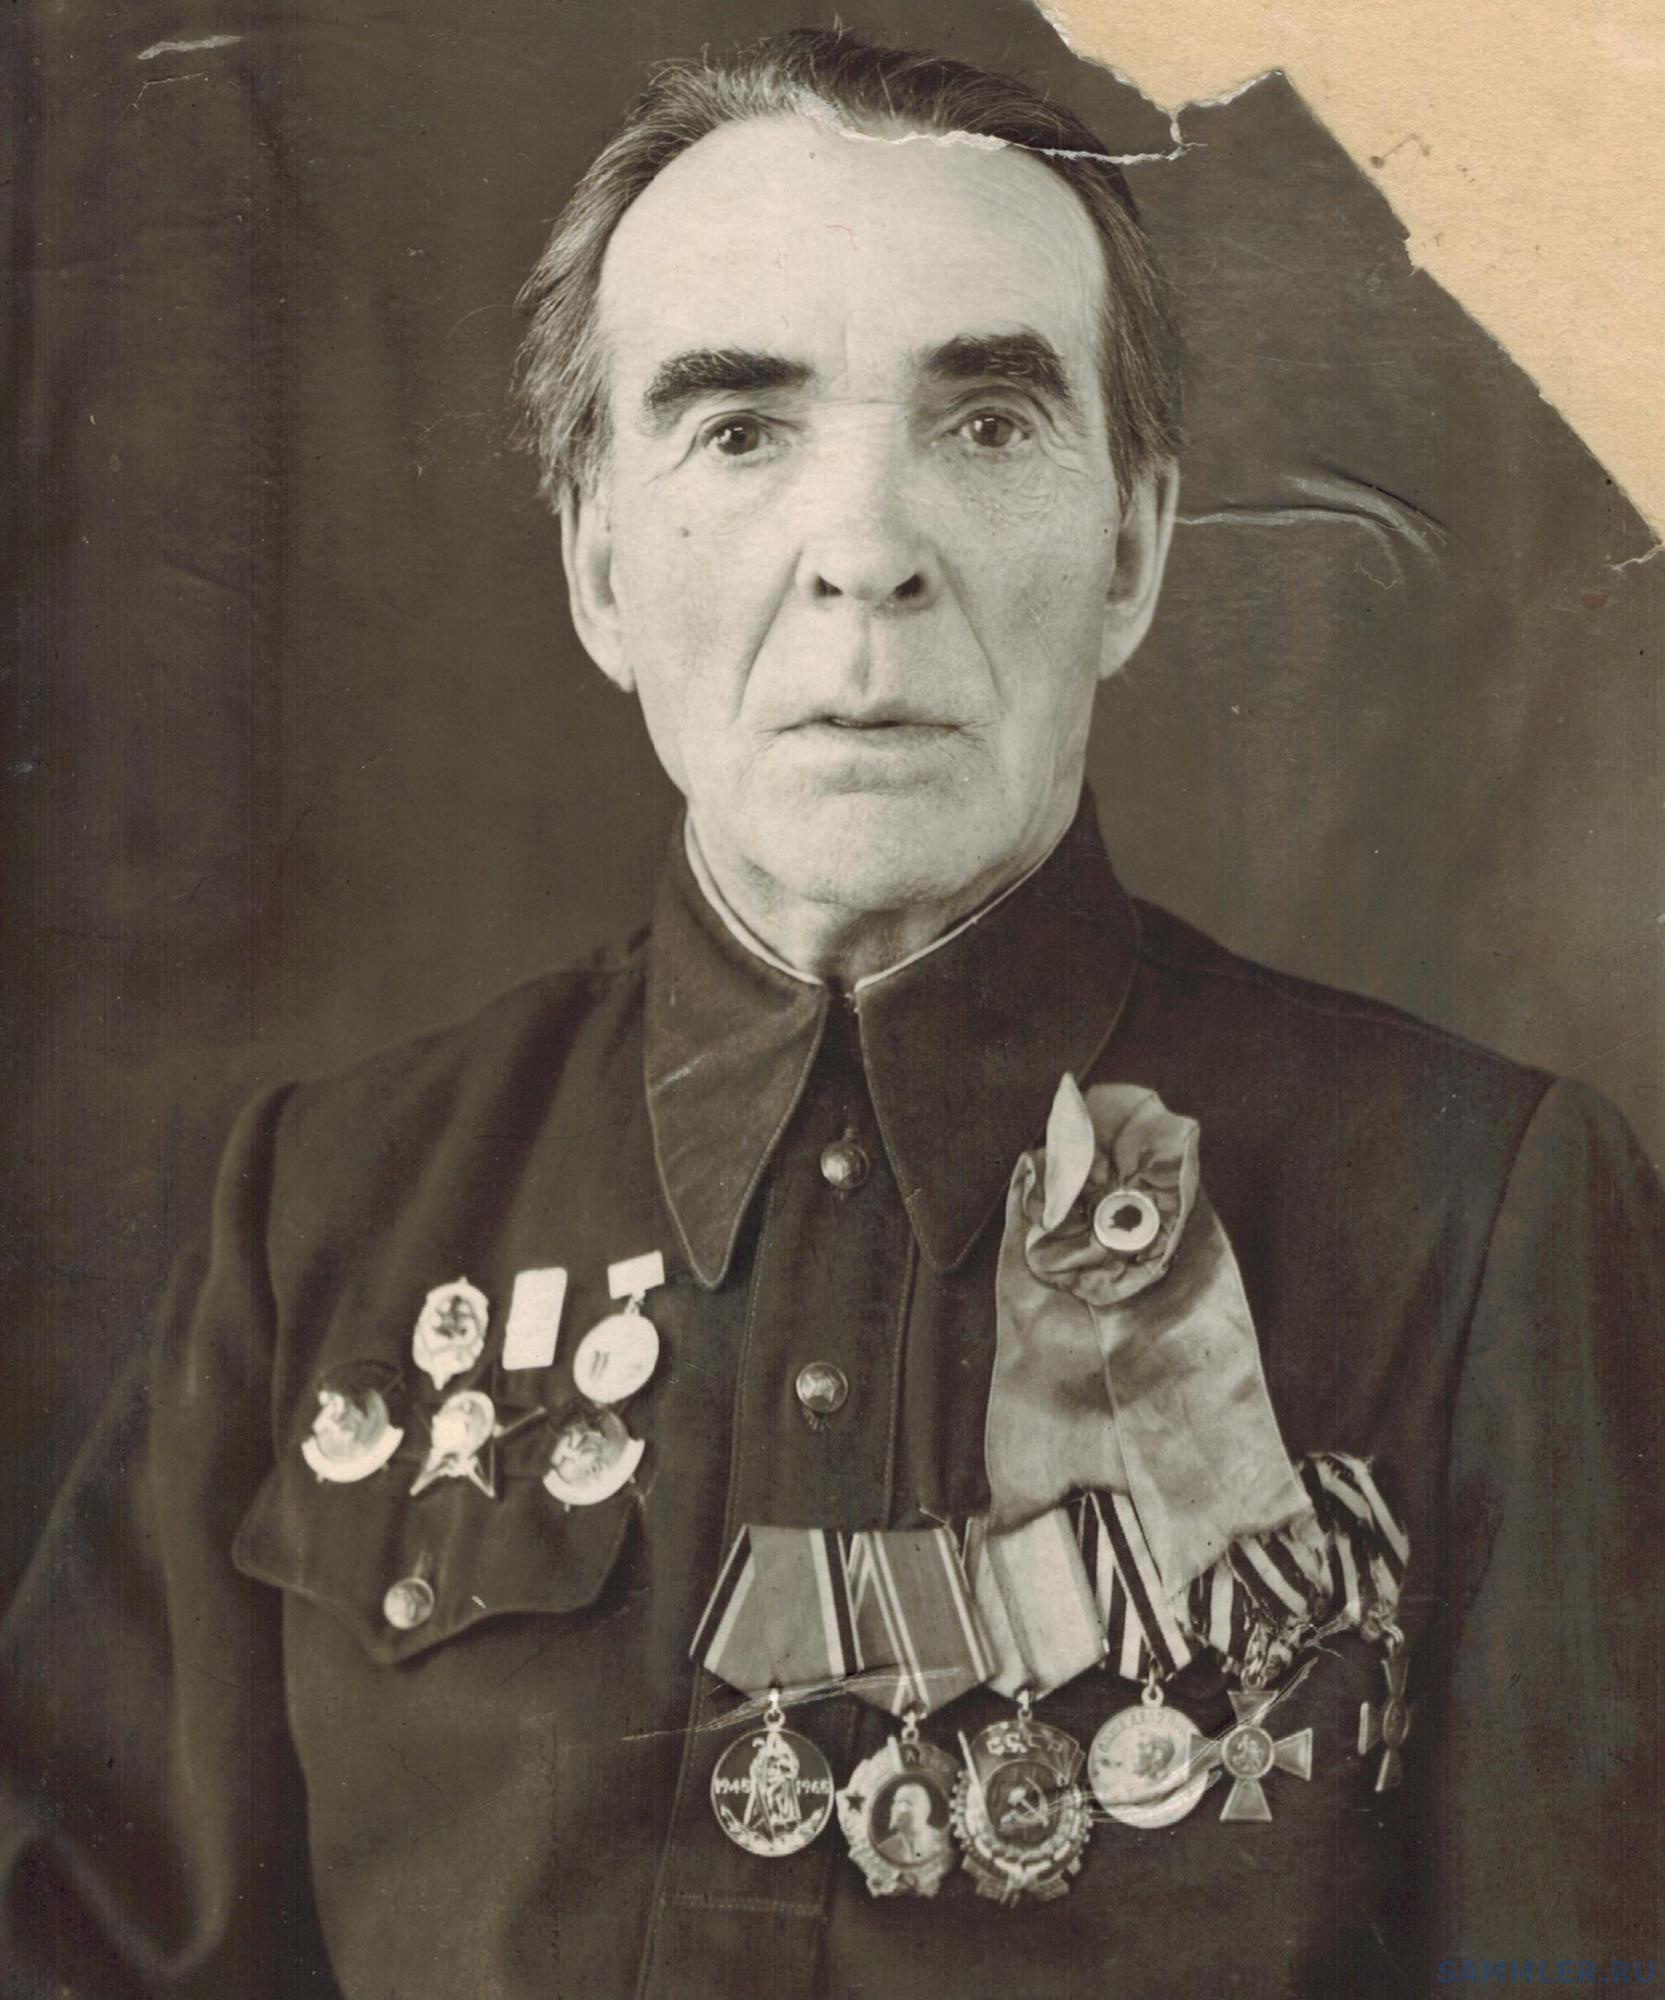 Тимофеев Архип Андреевич 001.jpg